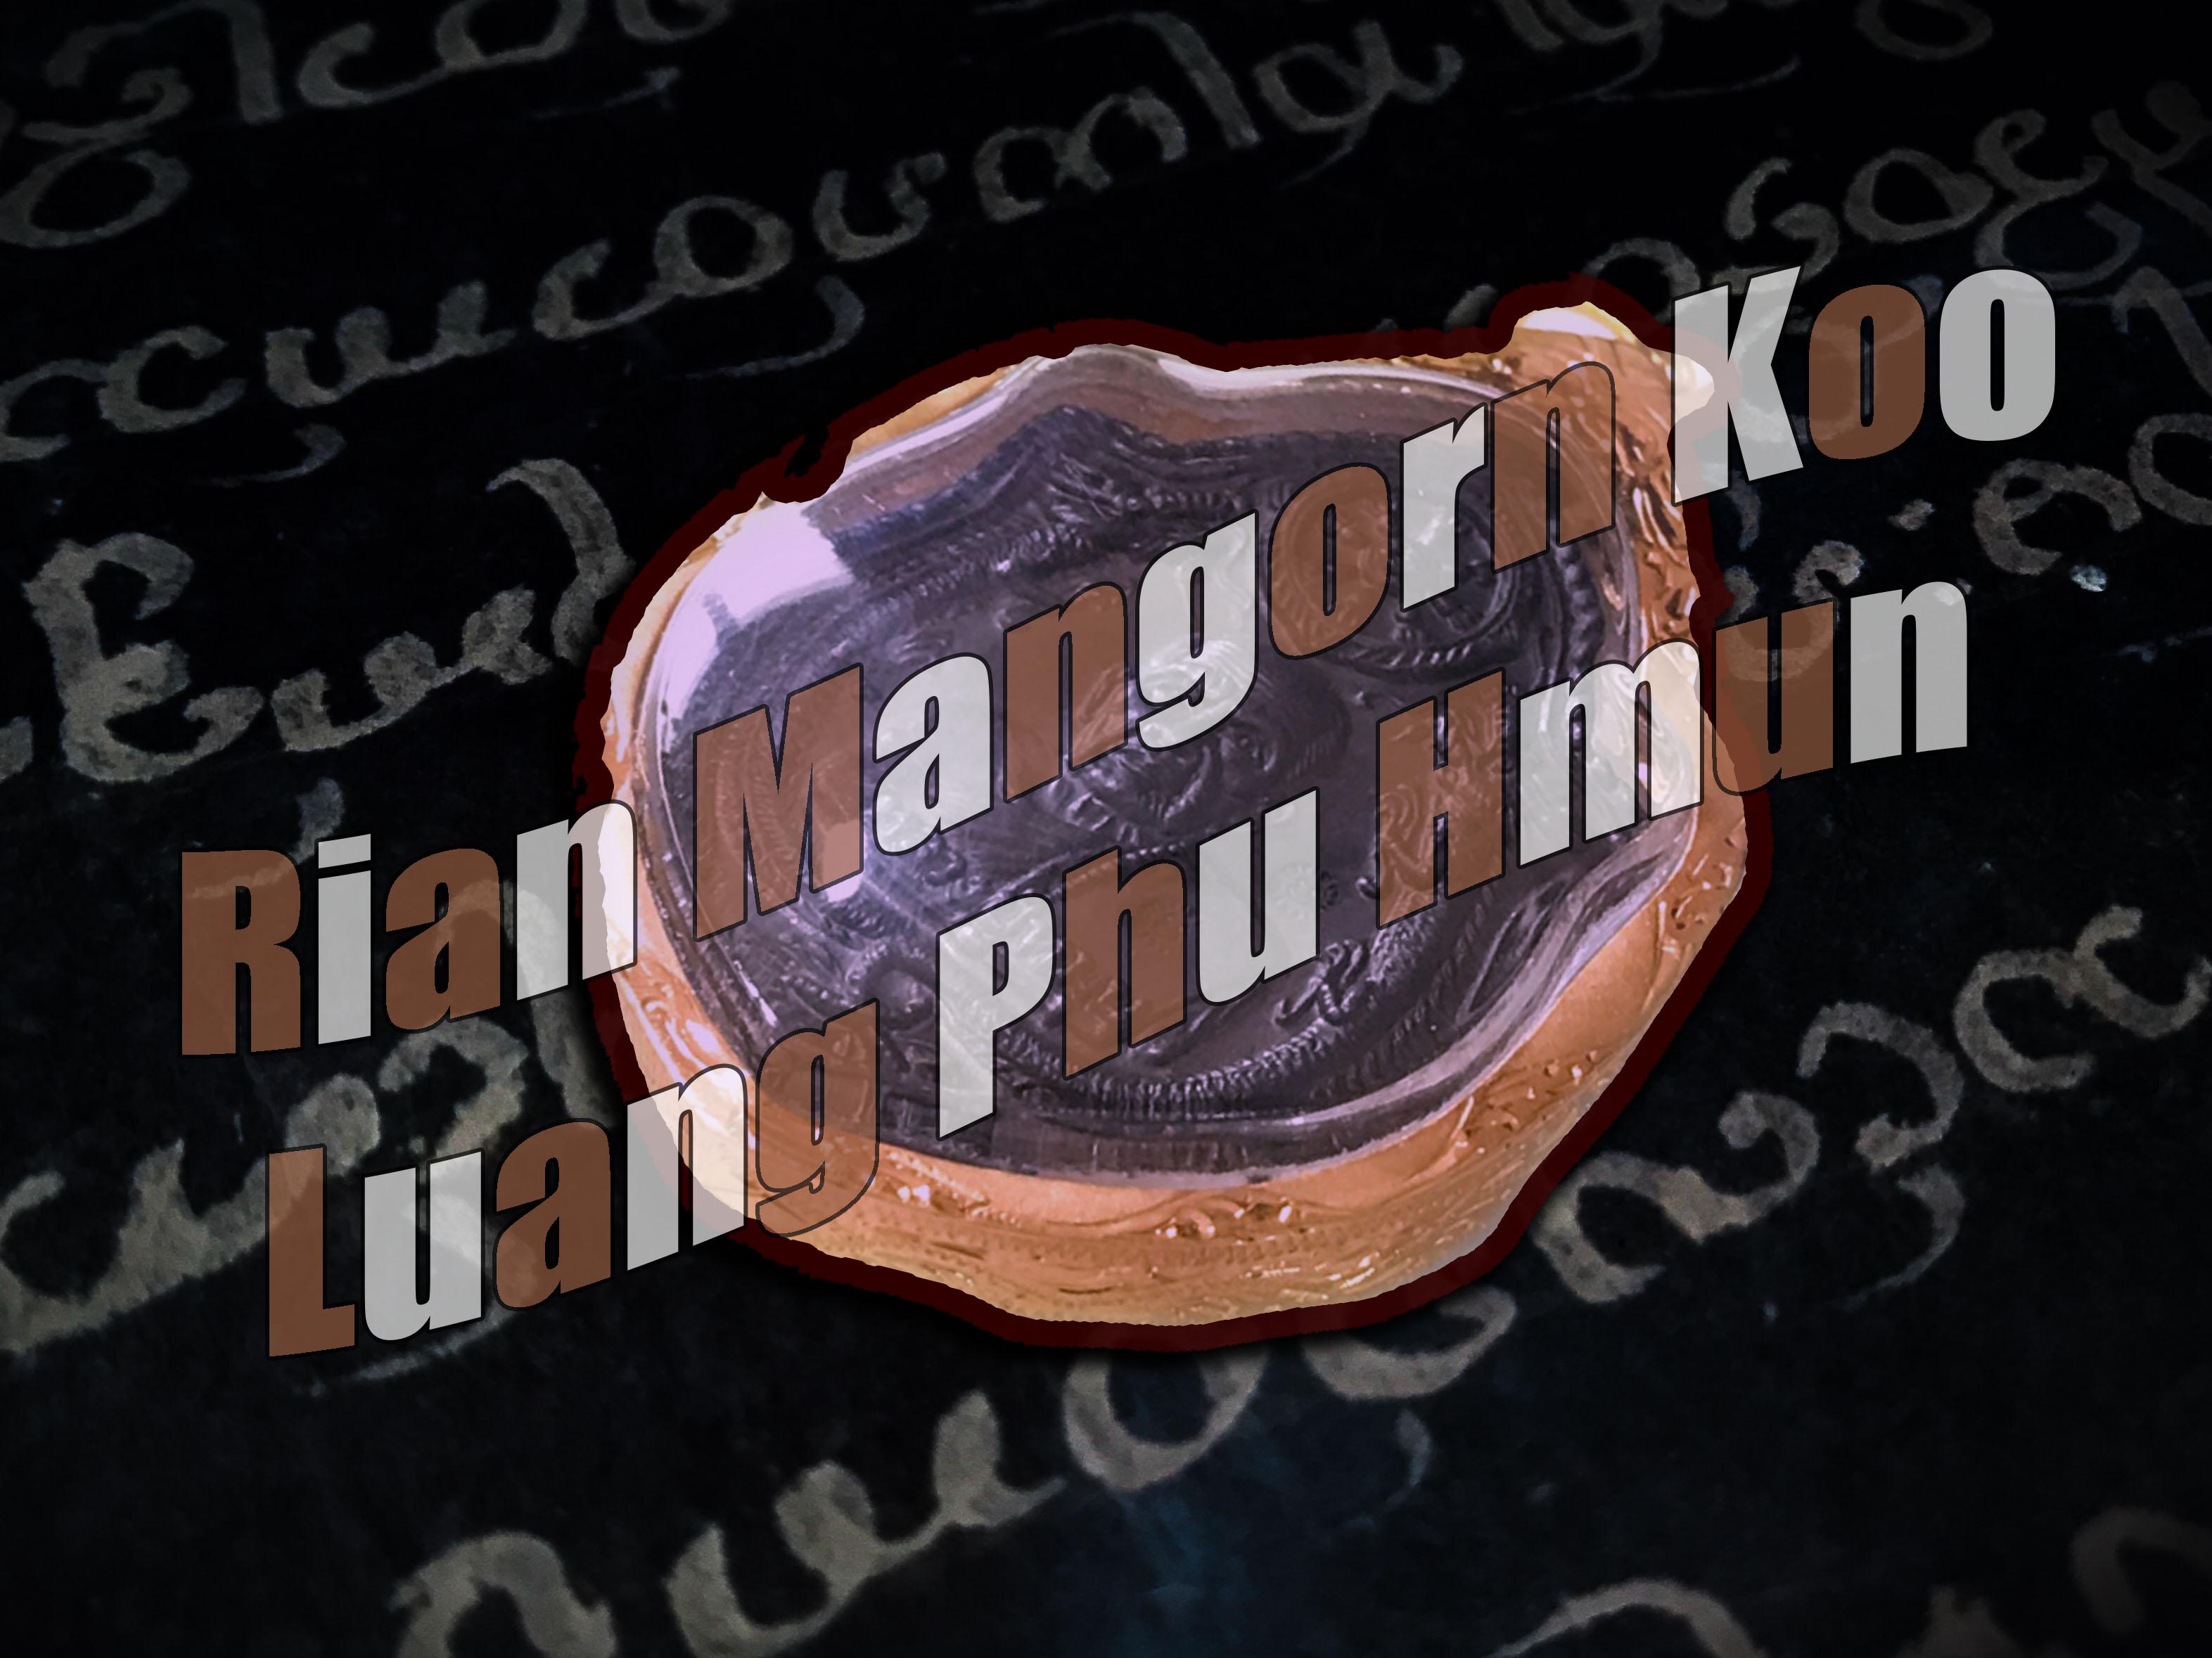 Rian Mangorn Koo Rare Version Nava Loha 2 Codestamps LP Hmun